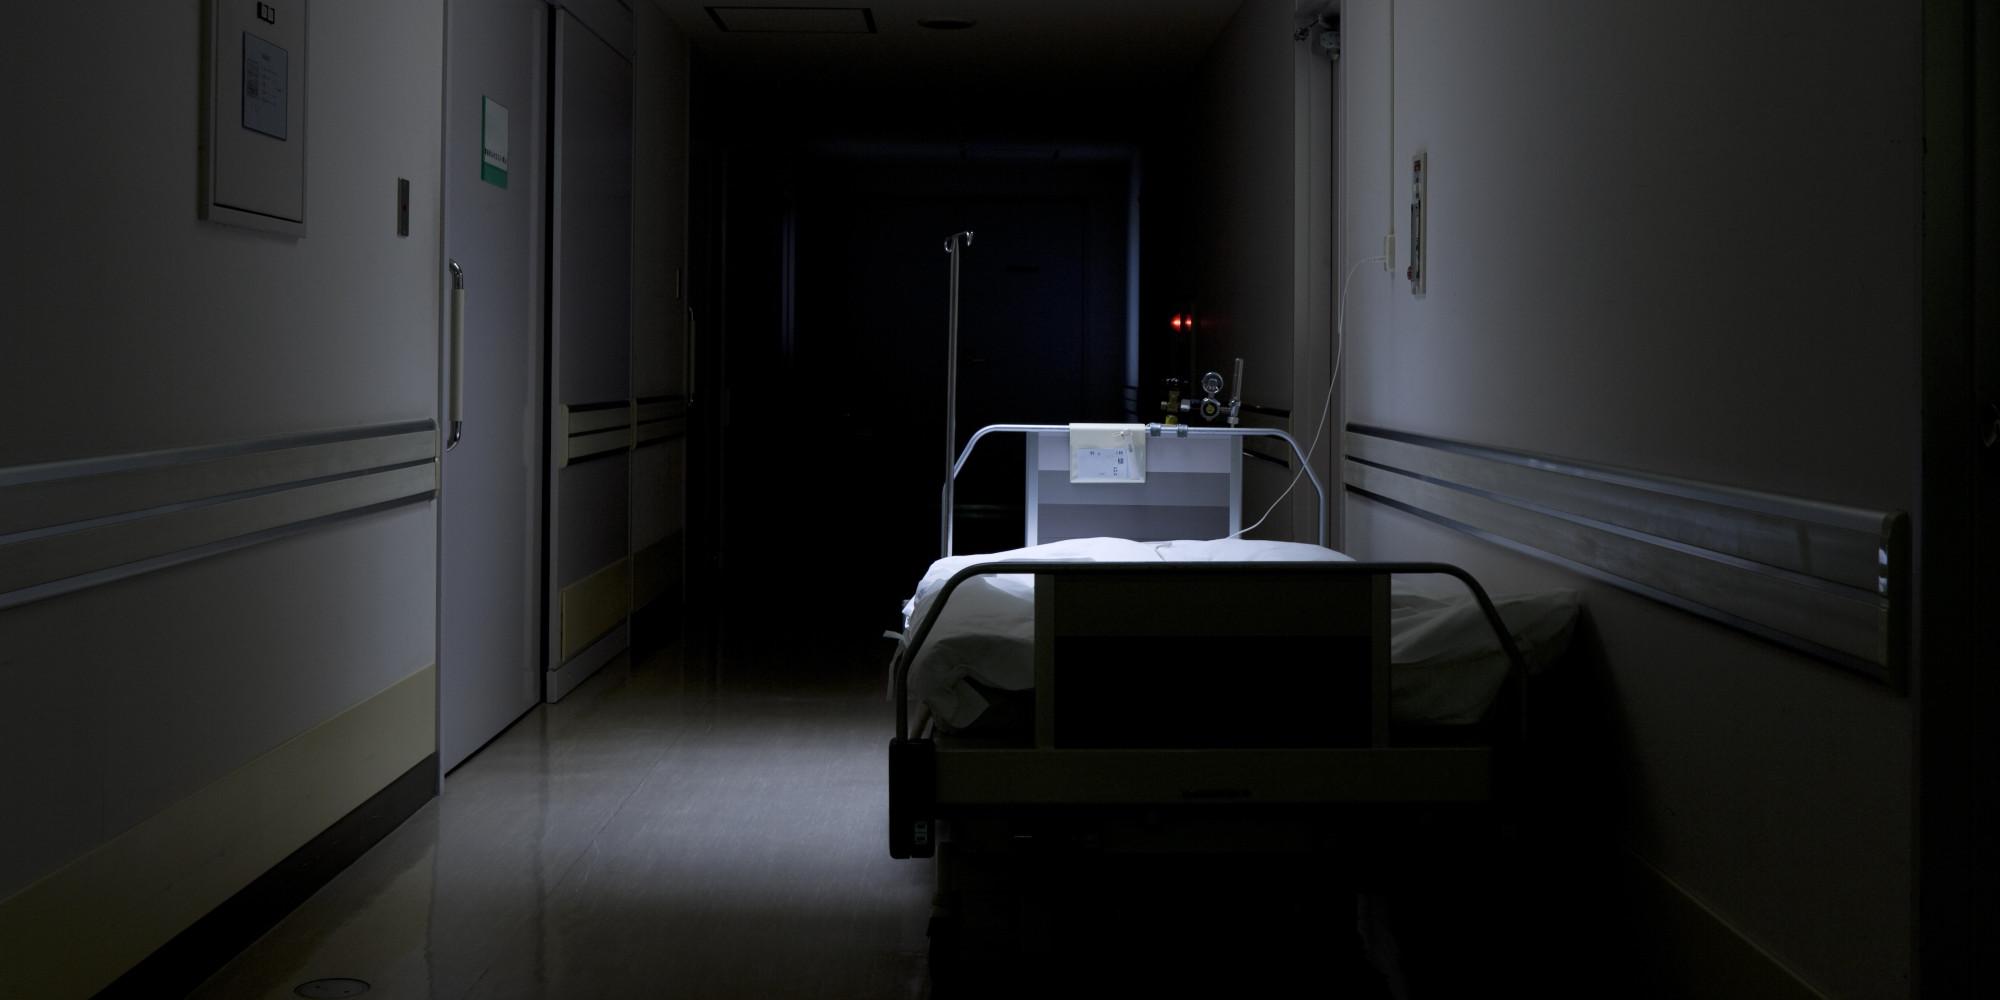 Empty Hospital Bed Tumblr